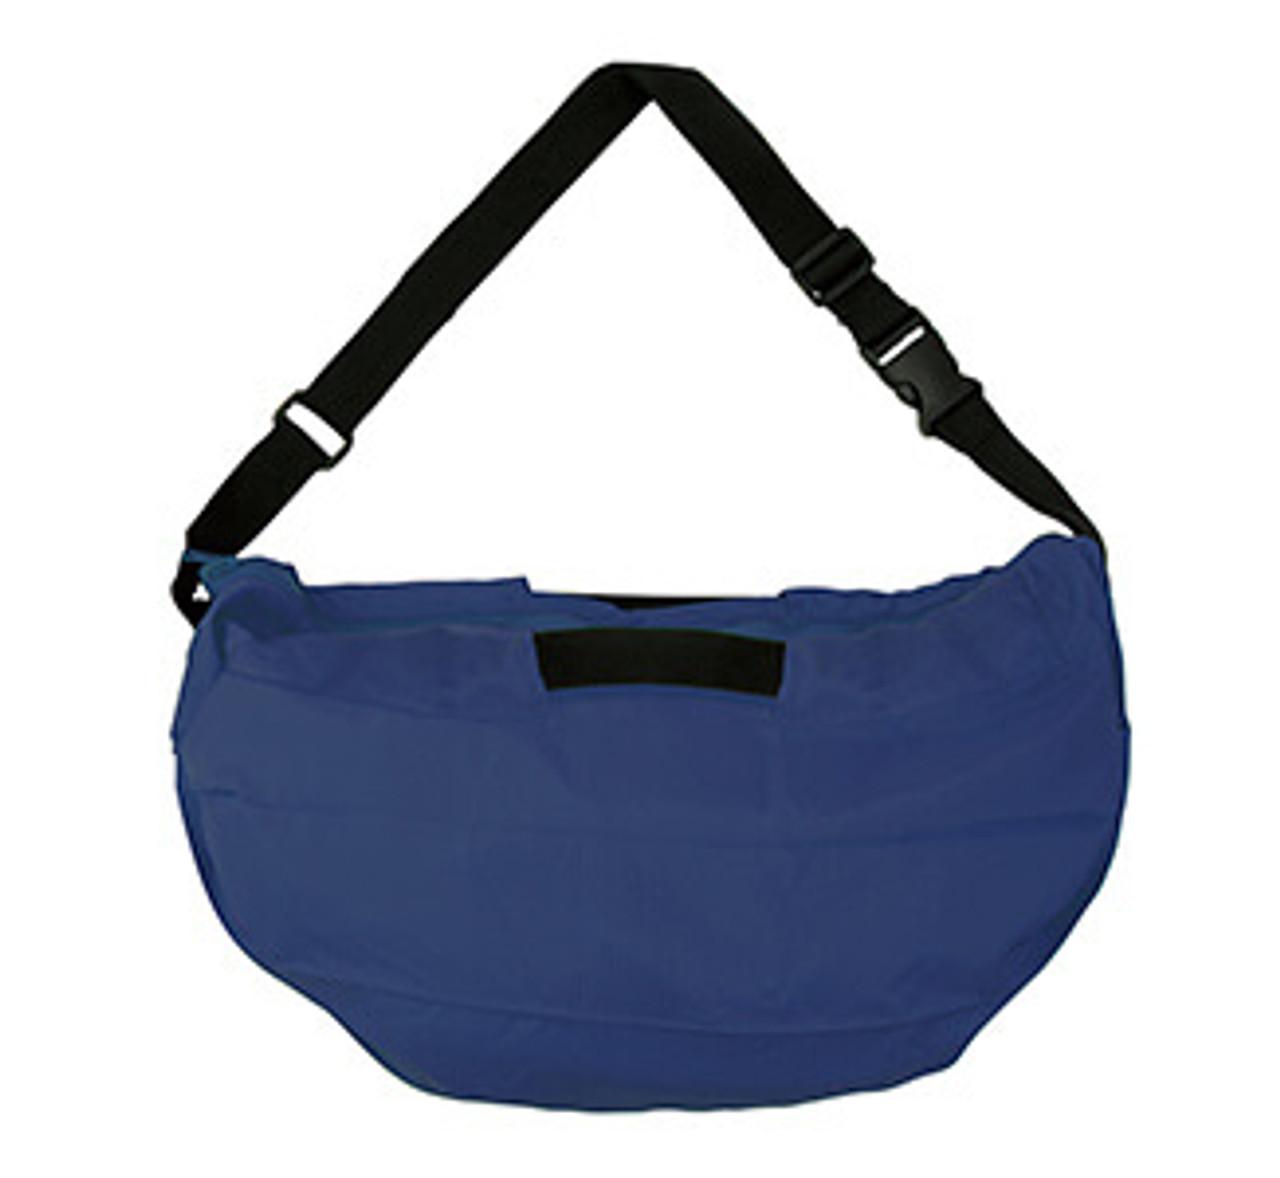 Marna Shupatto Shoulder Bag 2Way Navy Складная сумка через плечо